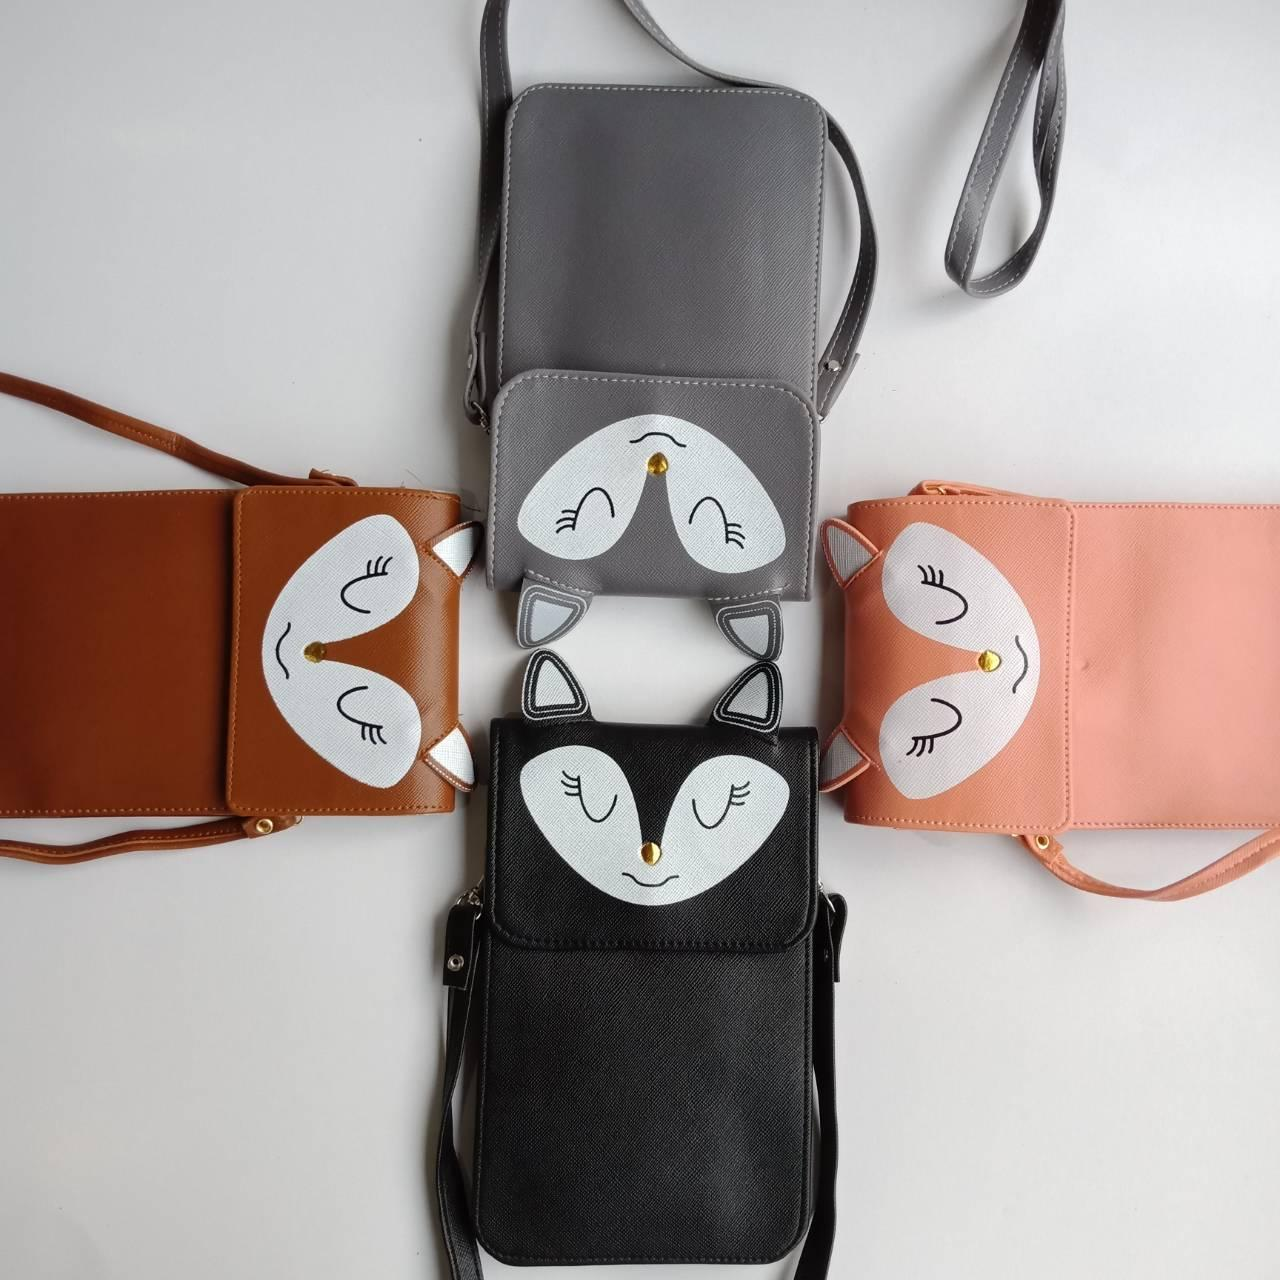 Tas Mini Bag Selempang Cantik 53298 Pink Unik Harga Terkini Wanita 33363 Black Import Ayunes Kecil Motif Lucu Sling Murah Simple